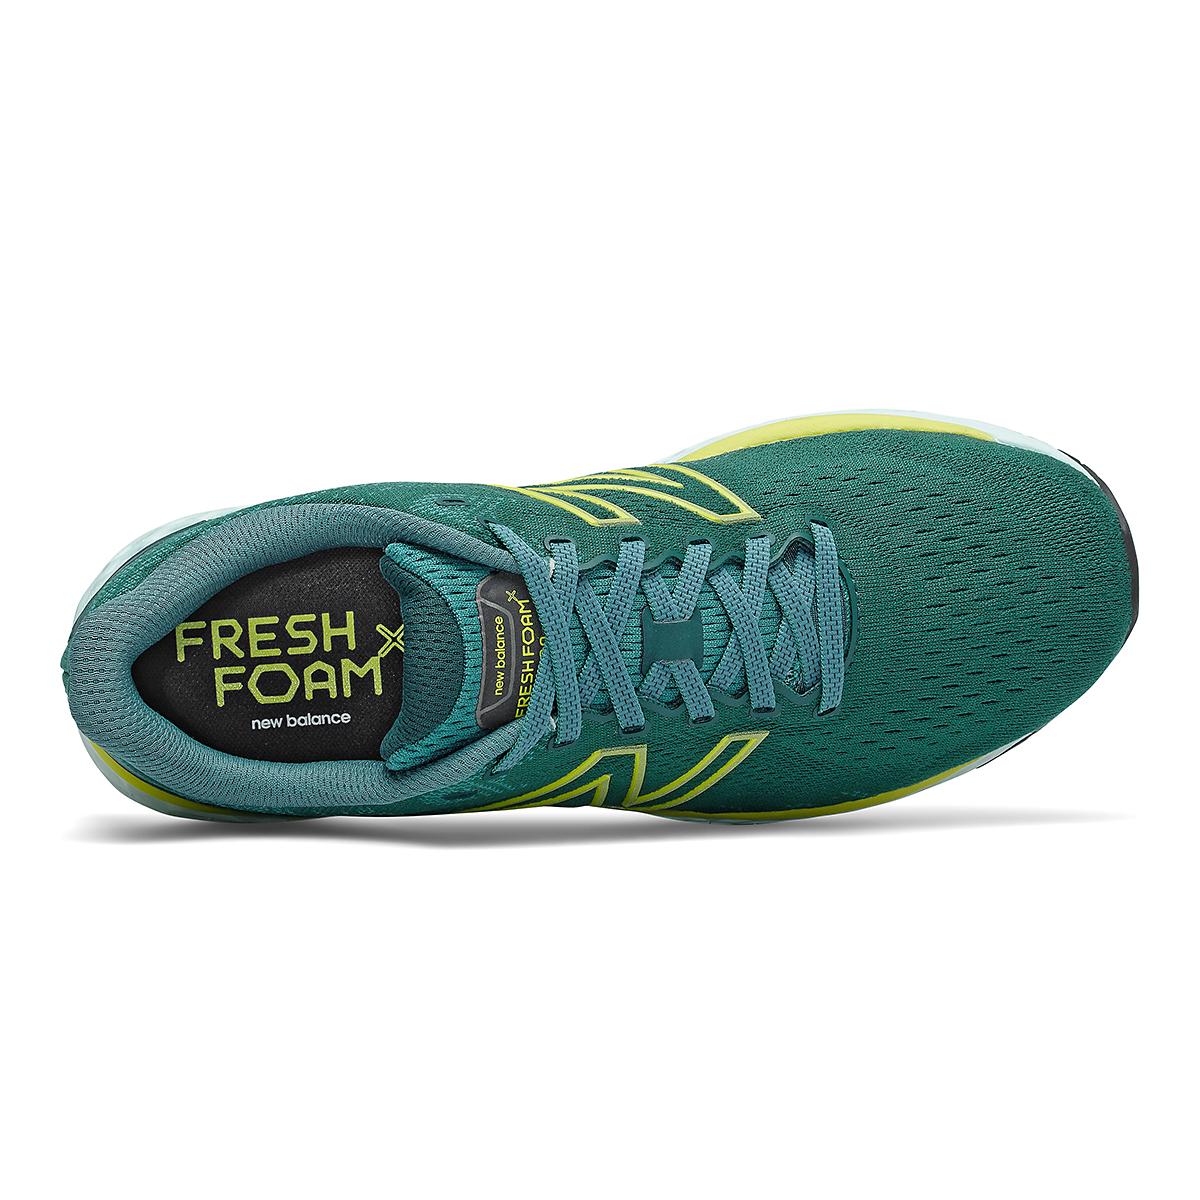 Men's New Balance Fresh Foam 880v11 Running Shoe - Color: Trek/Sulpher Yellow - Size: 7 - Width: Wide, Trek/Sulpher Yellow, large, image 4